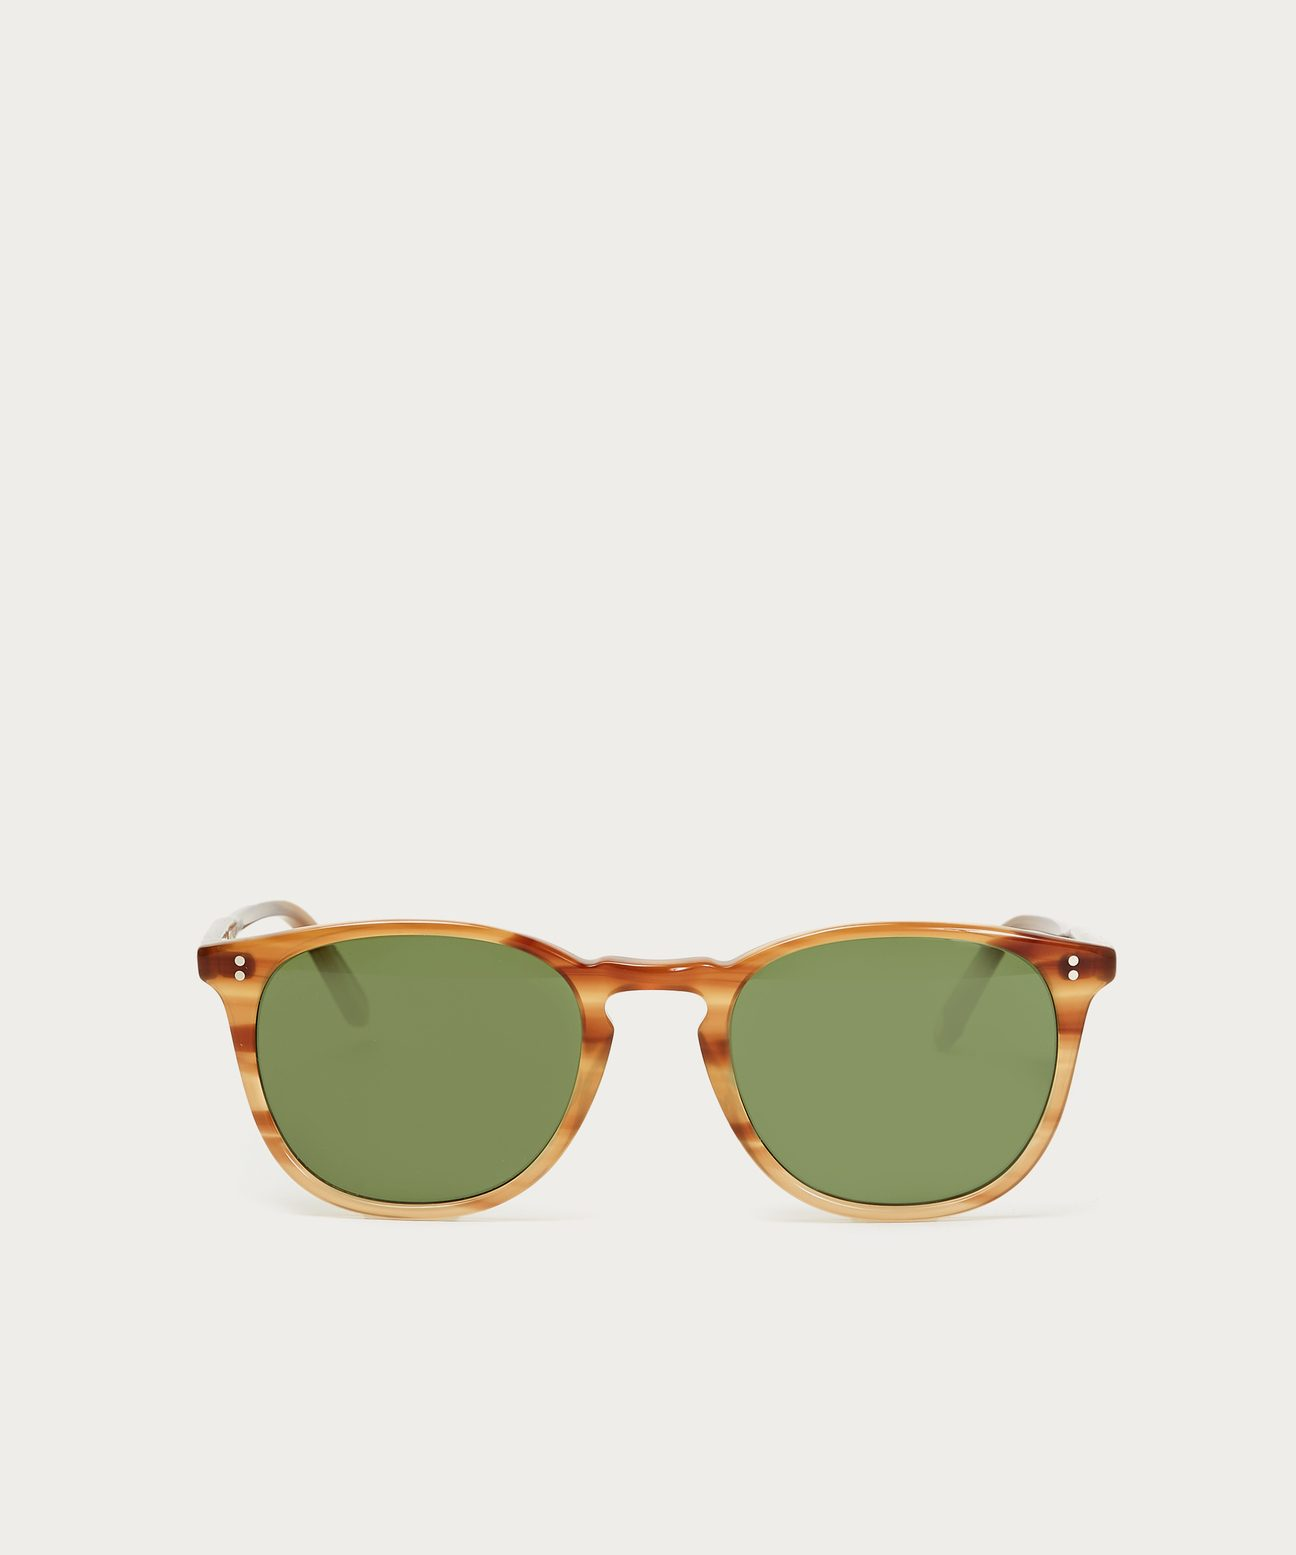 9ecc40057fadf Kinney Sunglasses - Tortoise Green